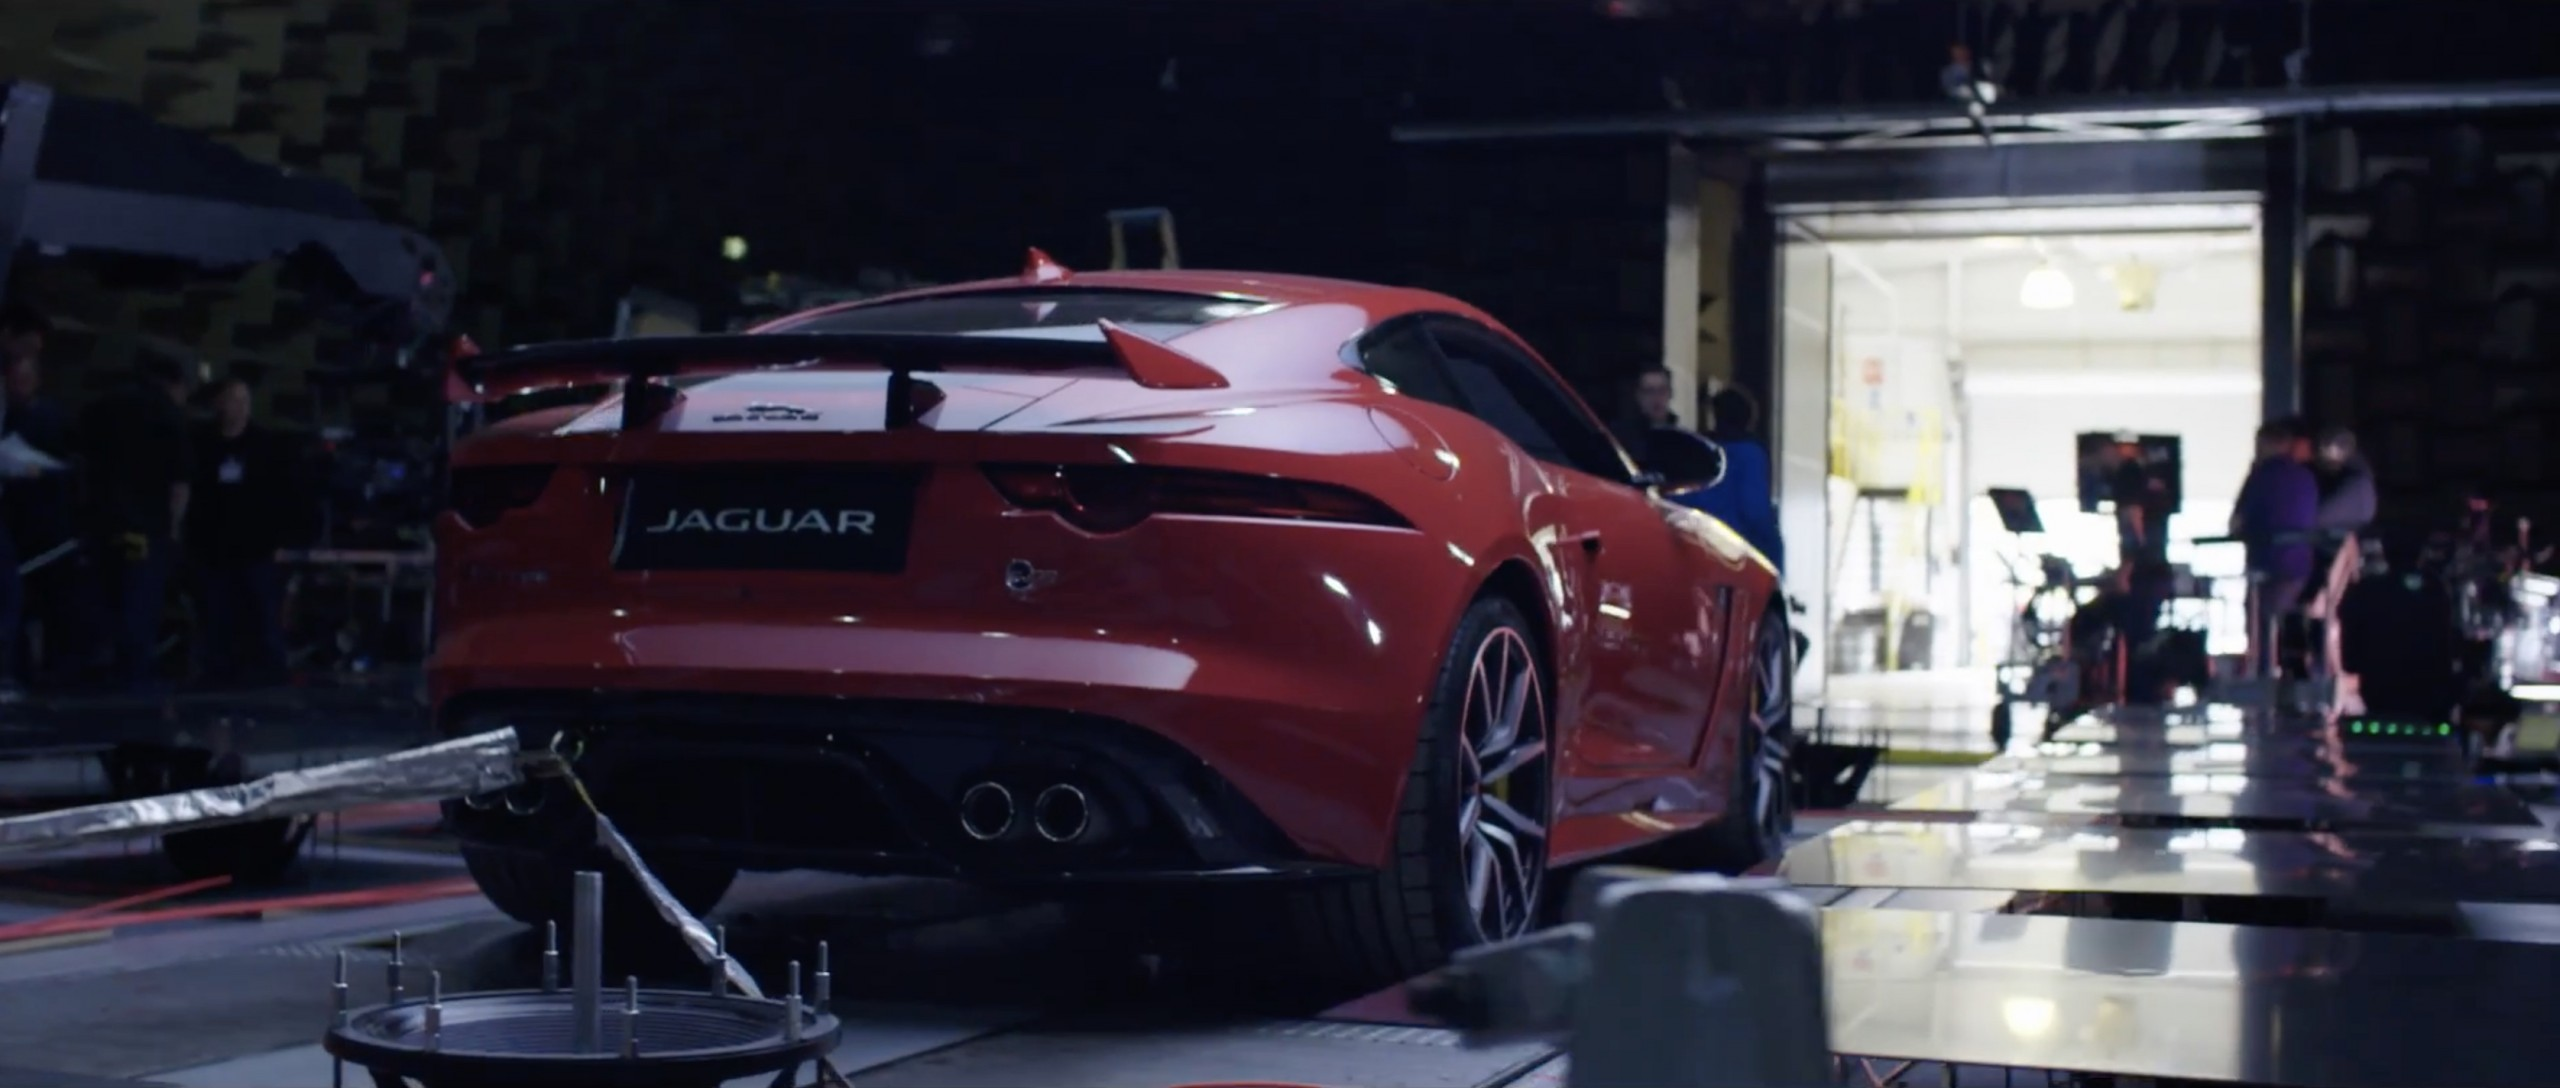 jaguar f-type SVR som cimática